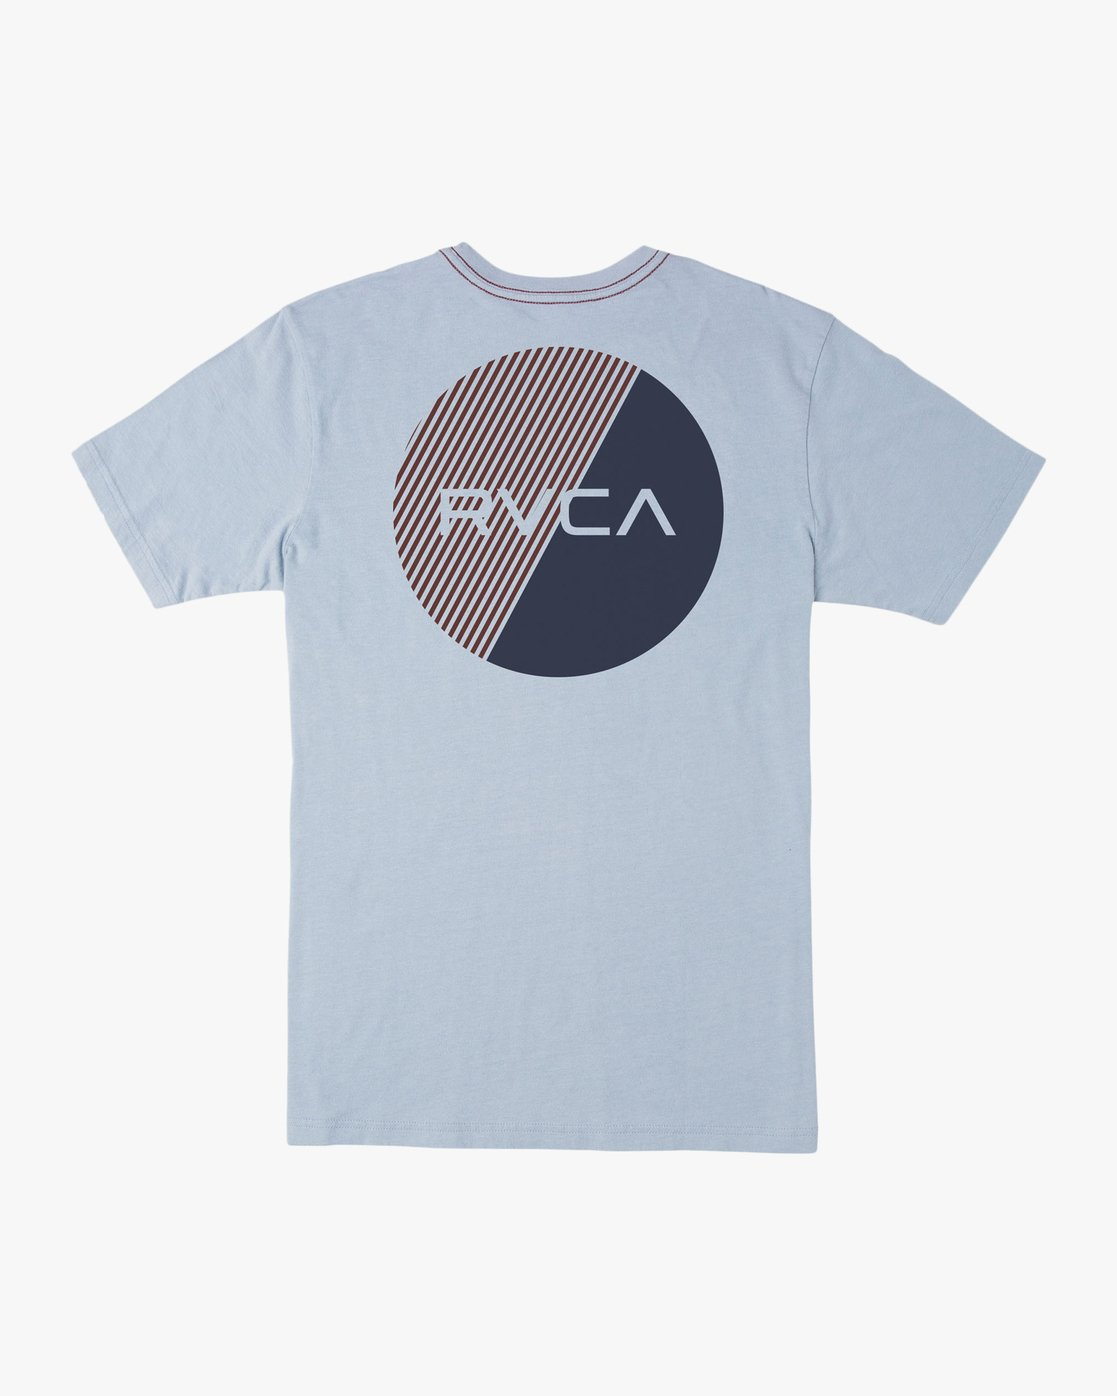 0 Blind Motors T-Shirt Blue M430TRBL RVCA